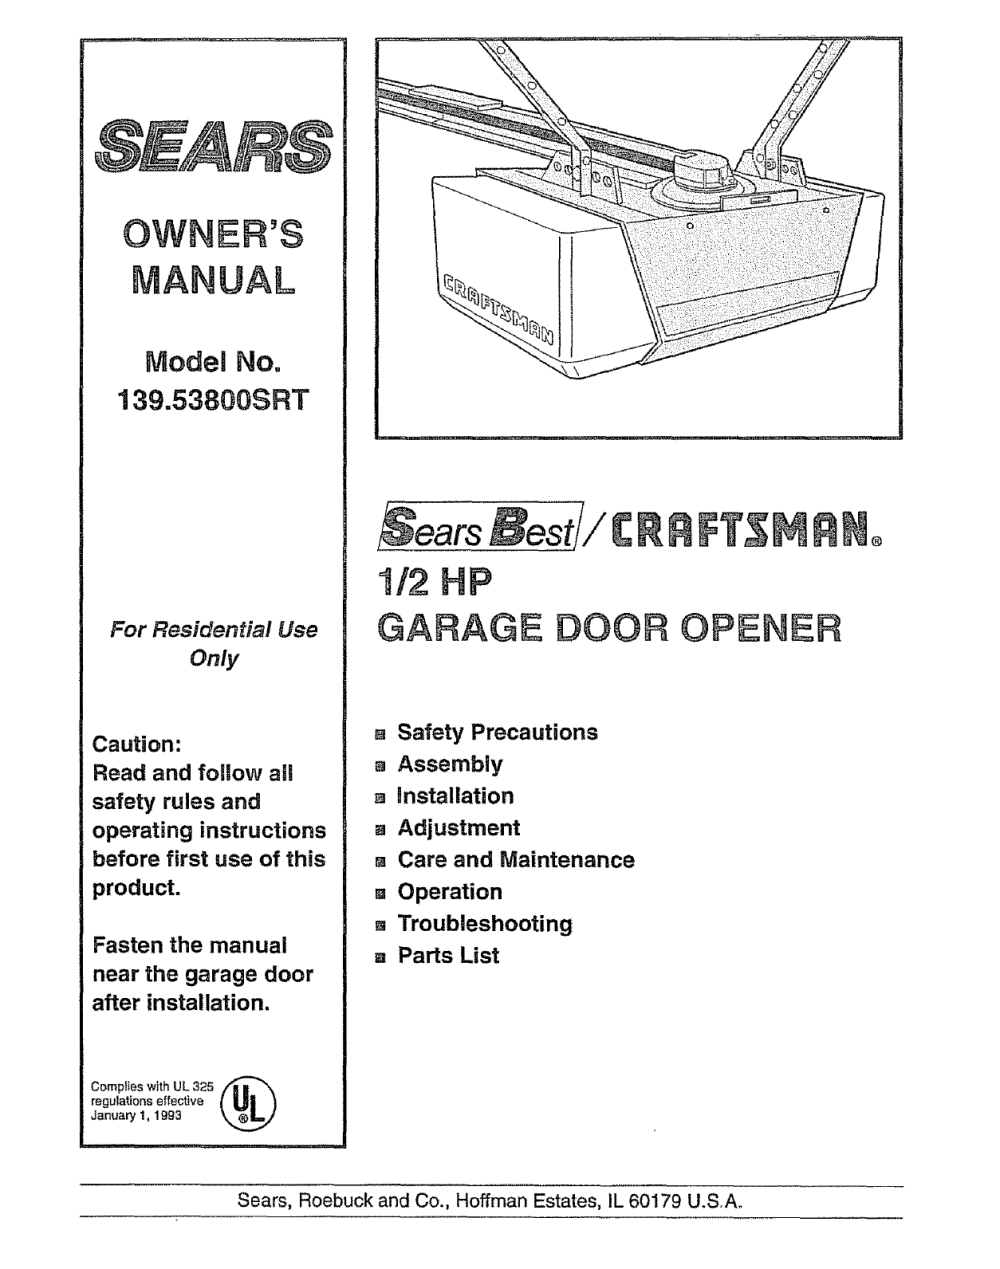 medium resolution of craftsman 13953800srt user manual 1 2 hp garage door opener manuals installation diagram and parts list for craftsman garagedooropener